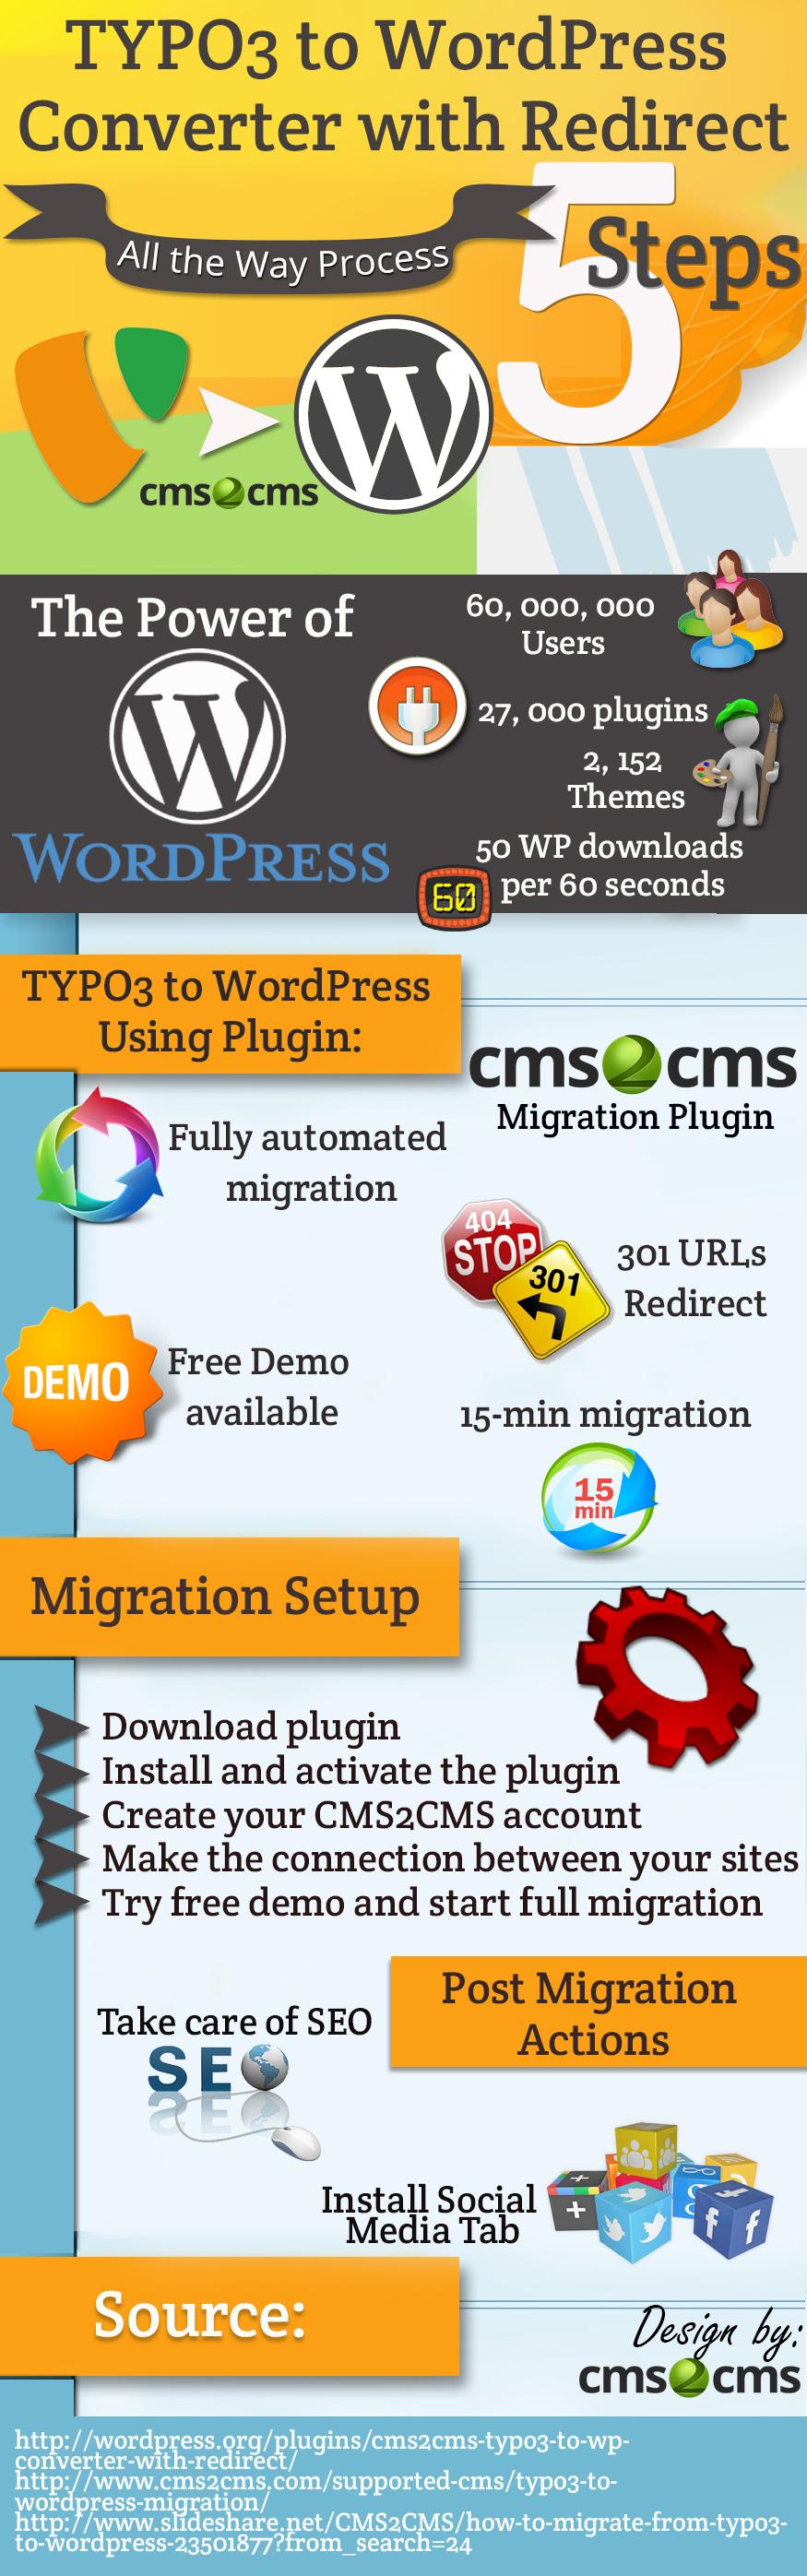 typo3-to-wordpress-migration-using-wordpress-plugin